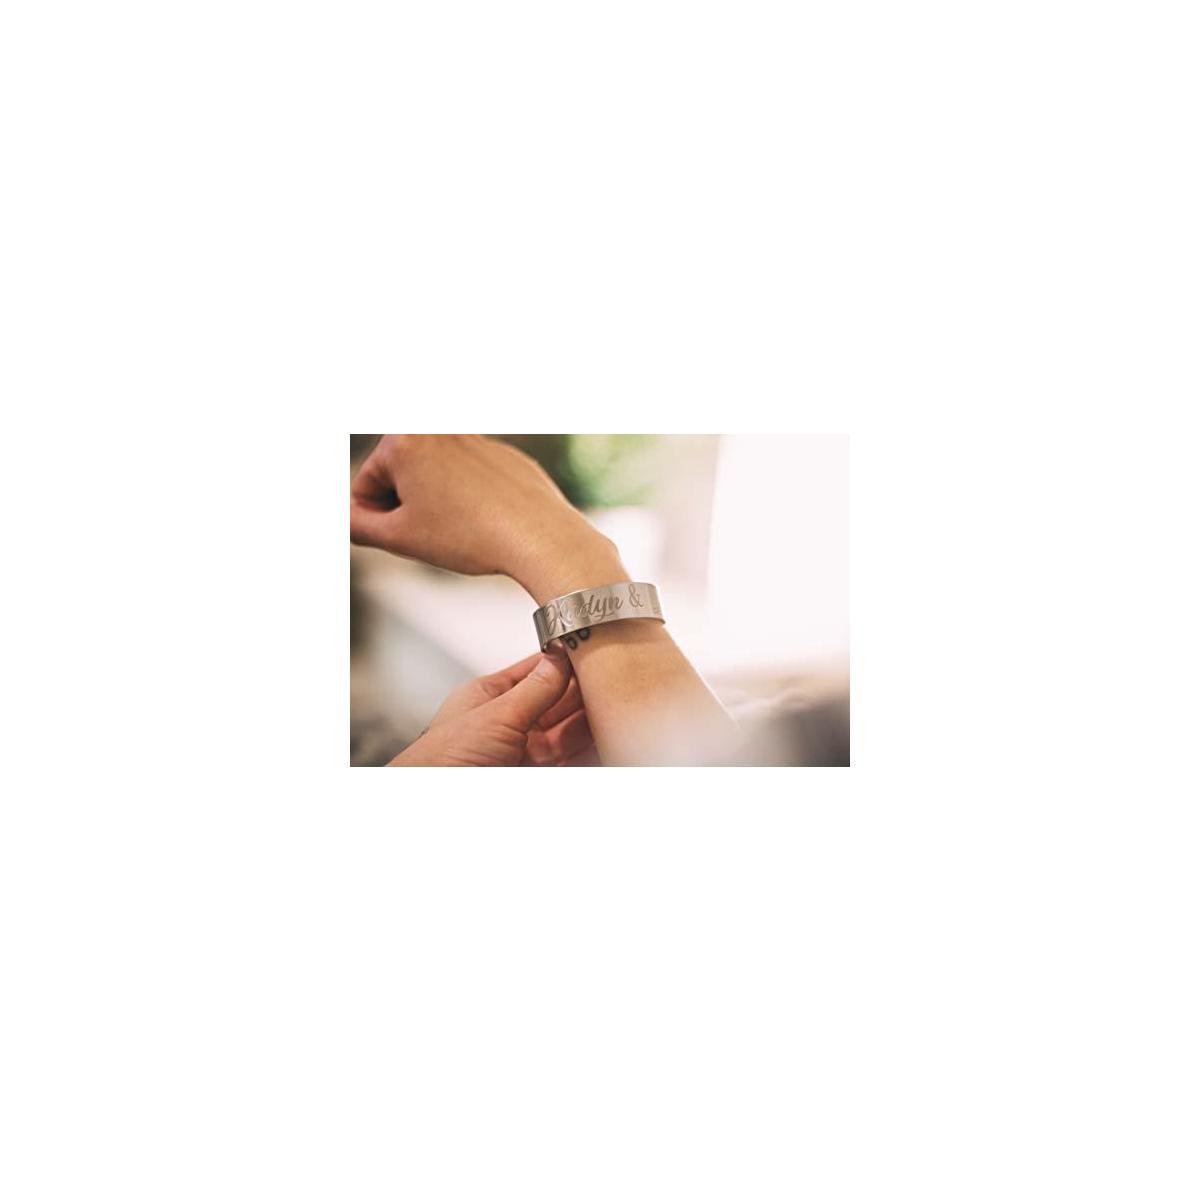 Custom Personalized Bracelet. Simple Customized Stainless Steel Single Bracelet for Women or Men